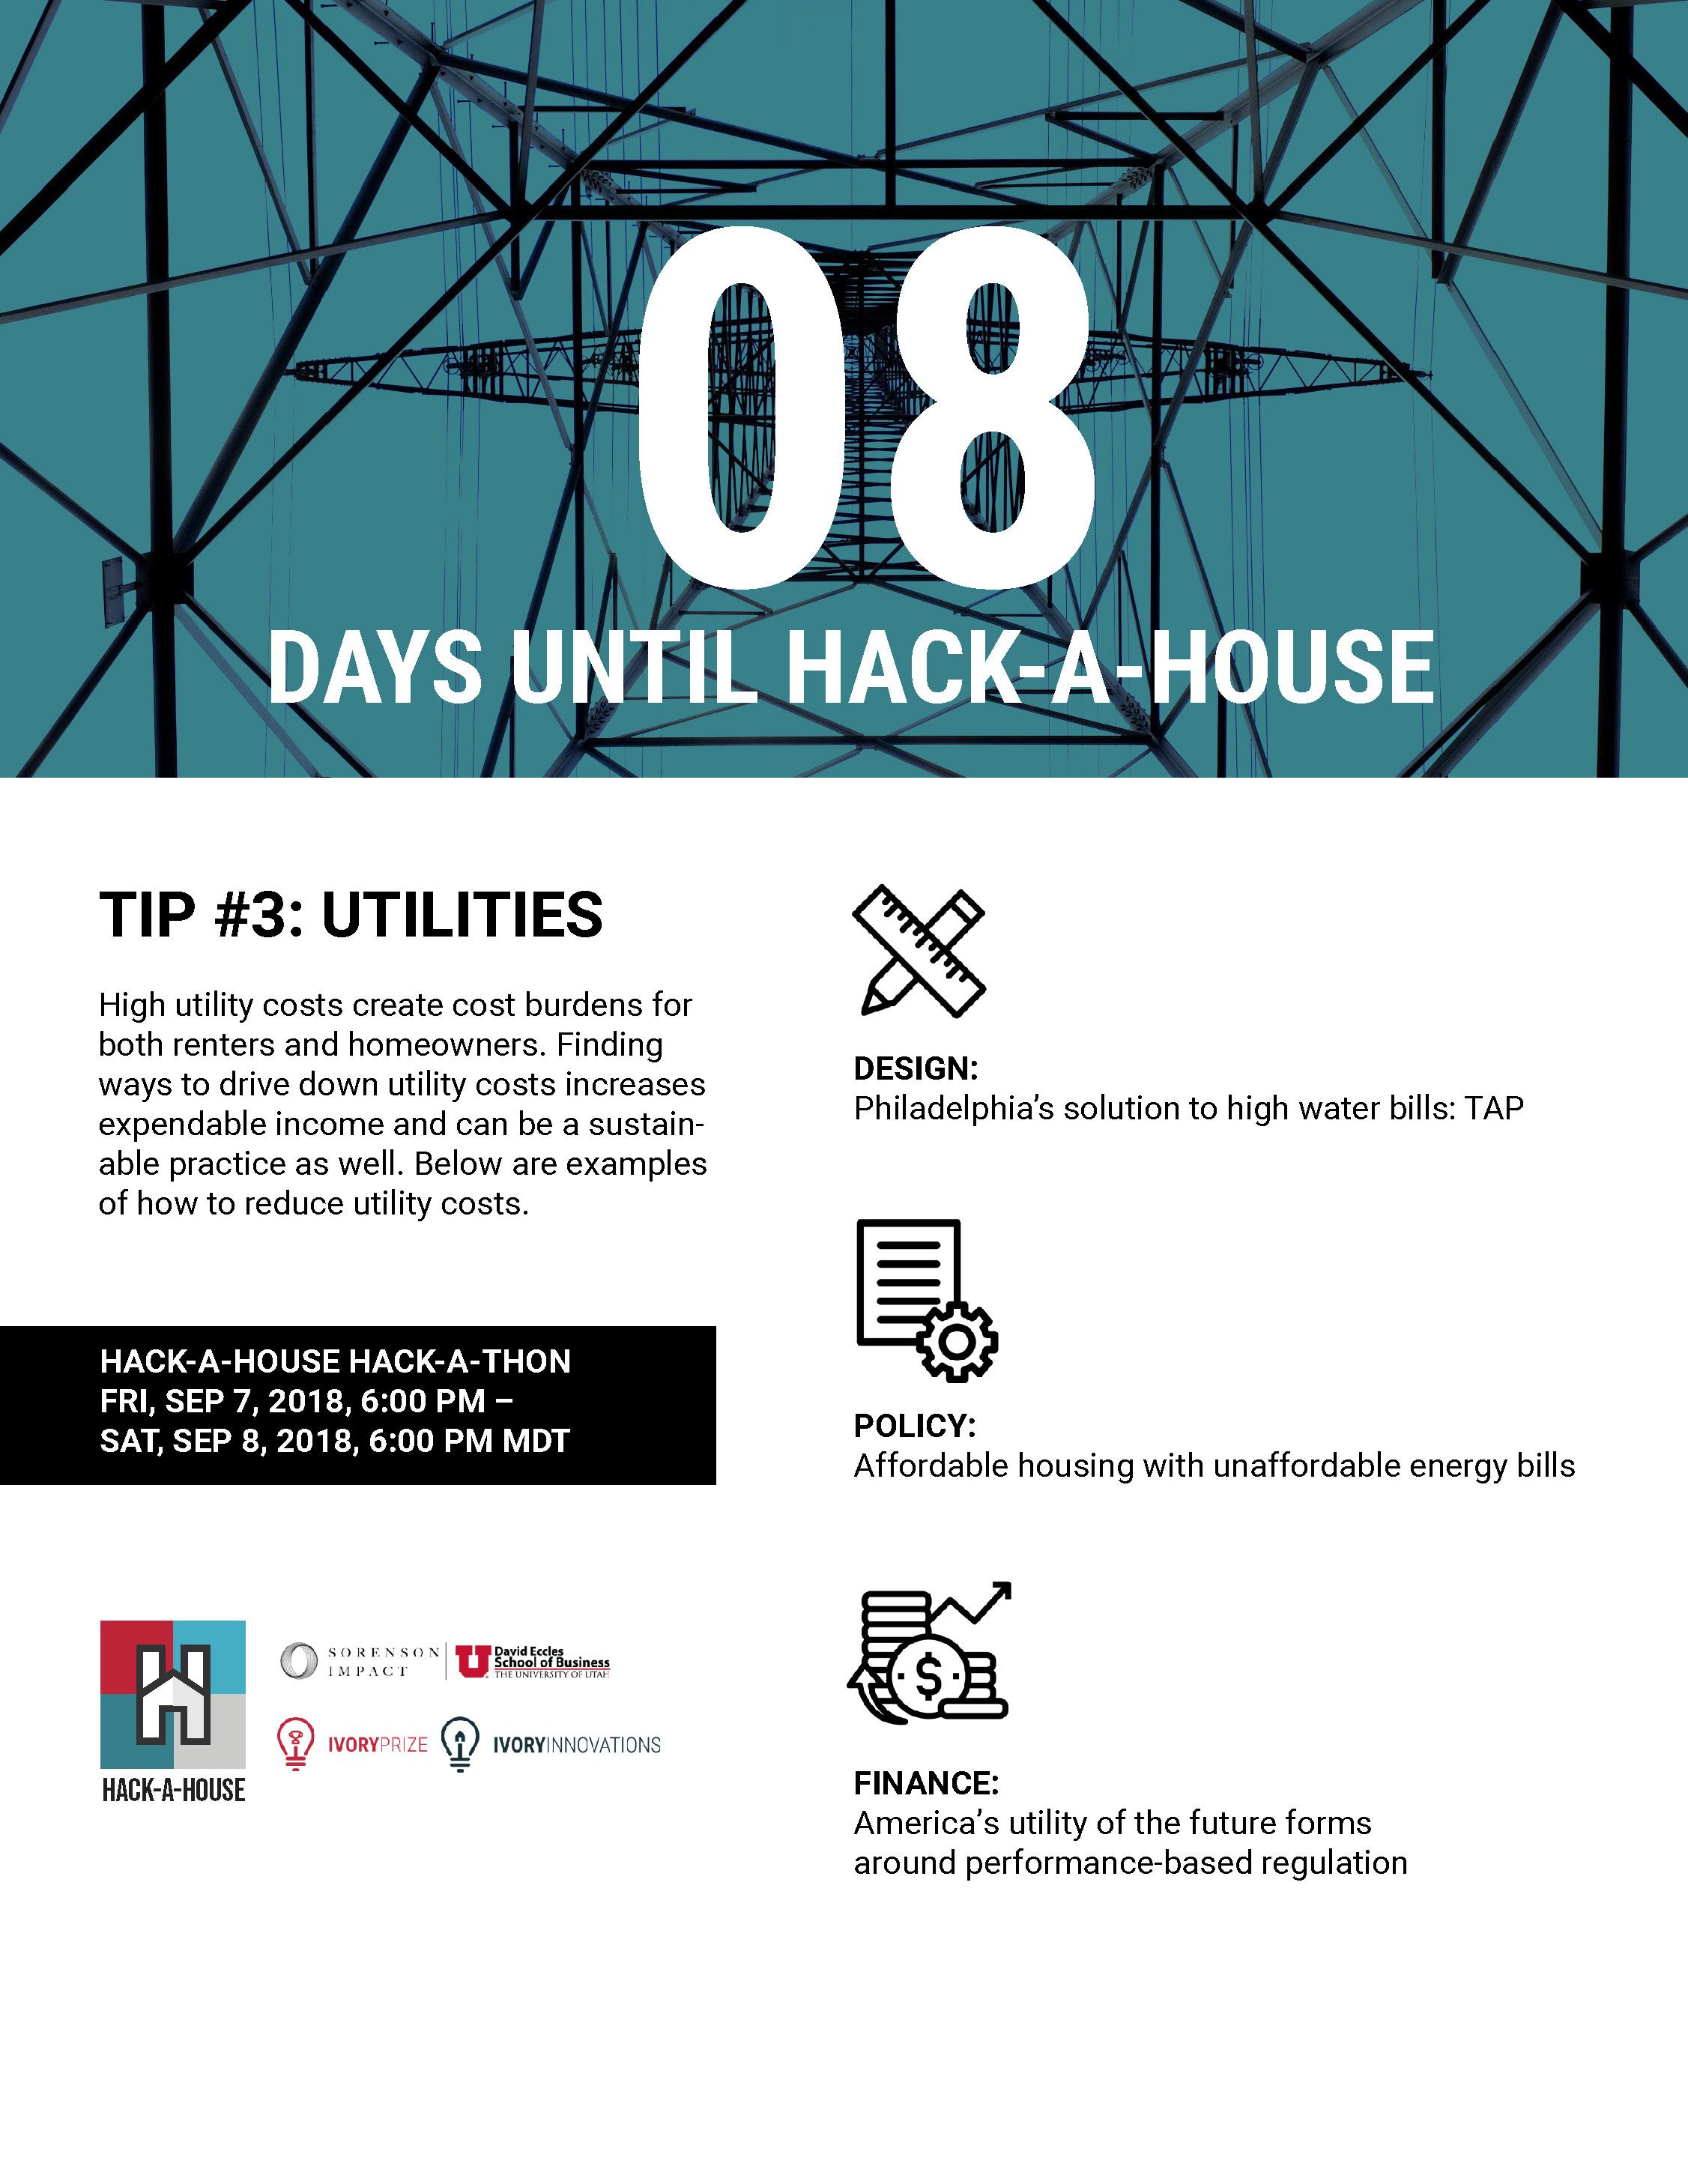 hack-a-house countdown_03.jpg